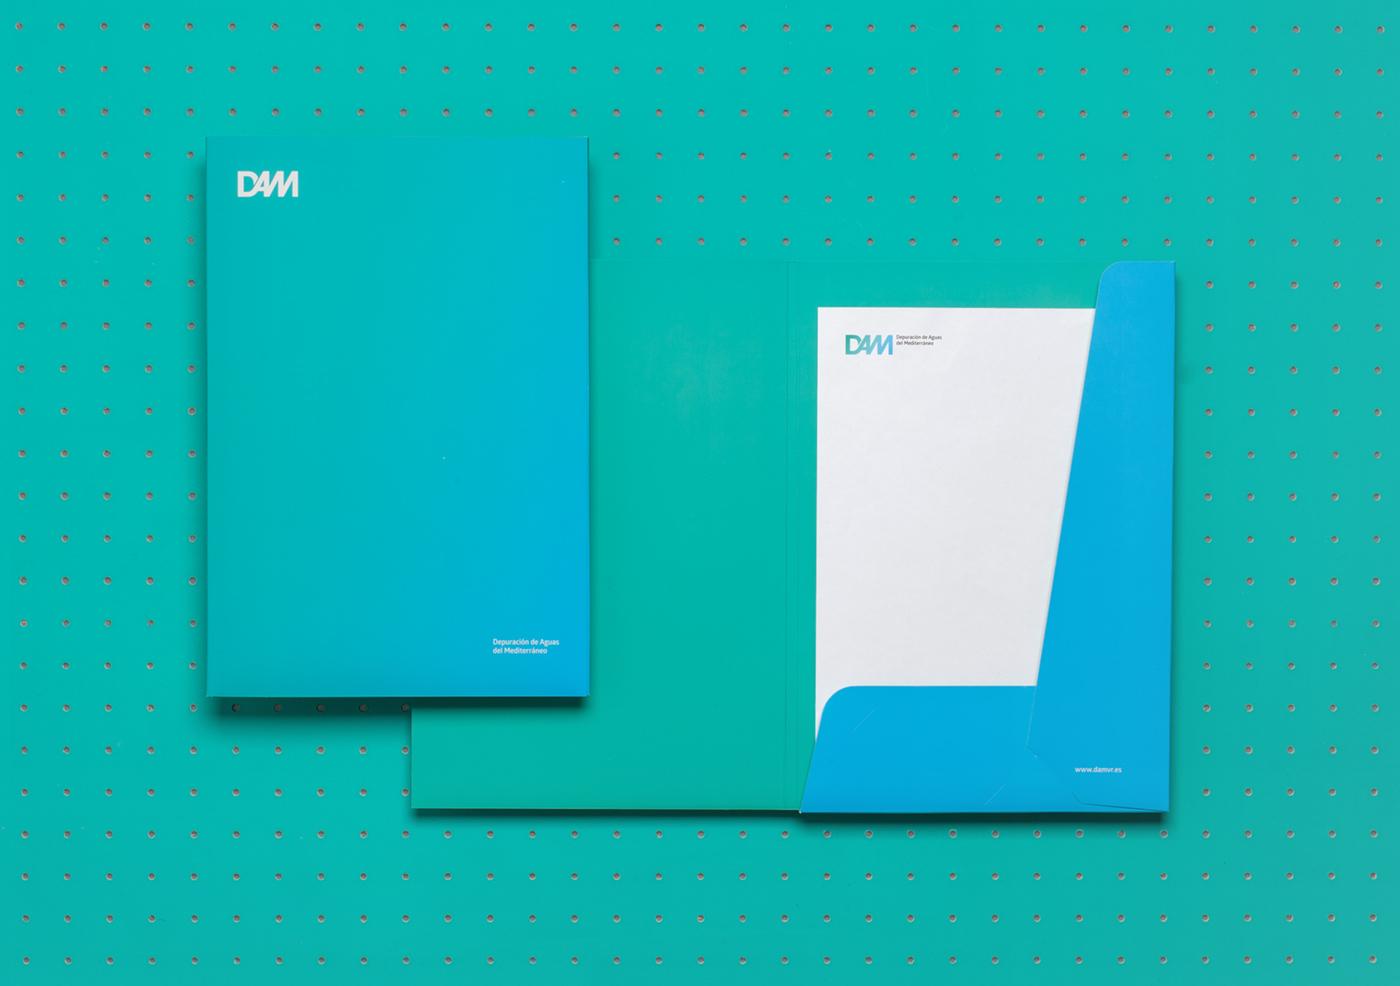 pixelarte-diseno-grafico-material-corporativo-Dam_Depuracion_Aguas_Mediterraneo